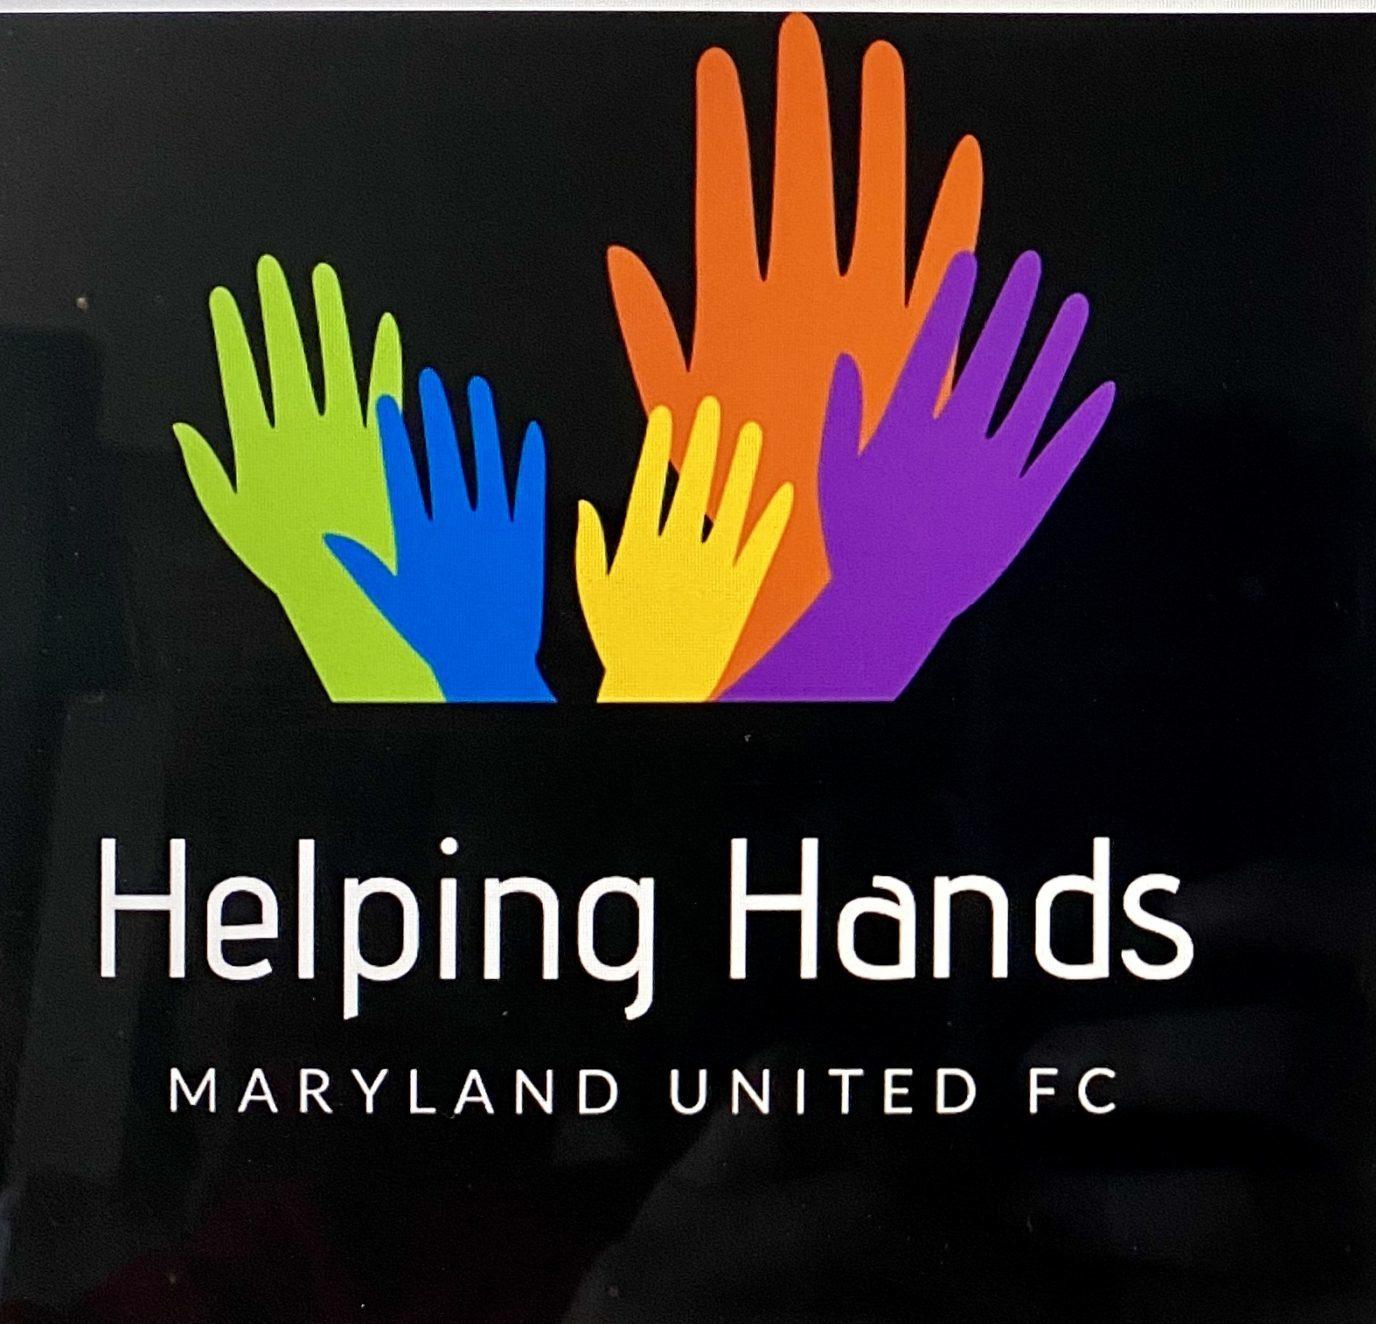 HelpingHandsCOVID19